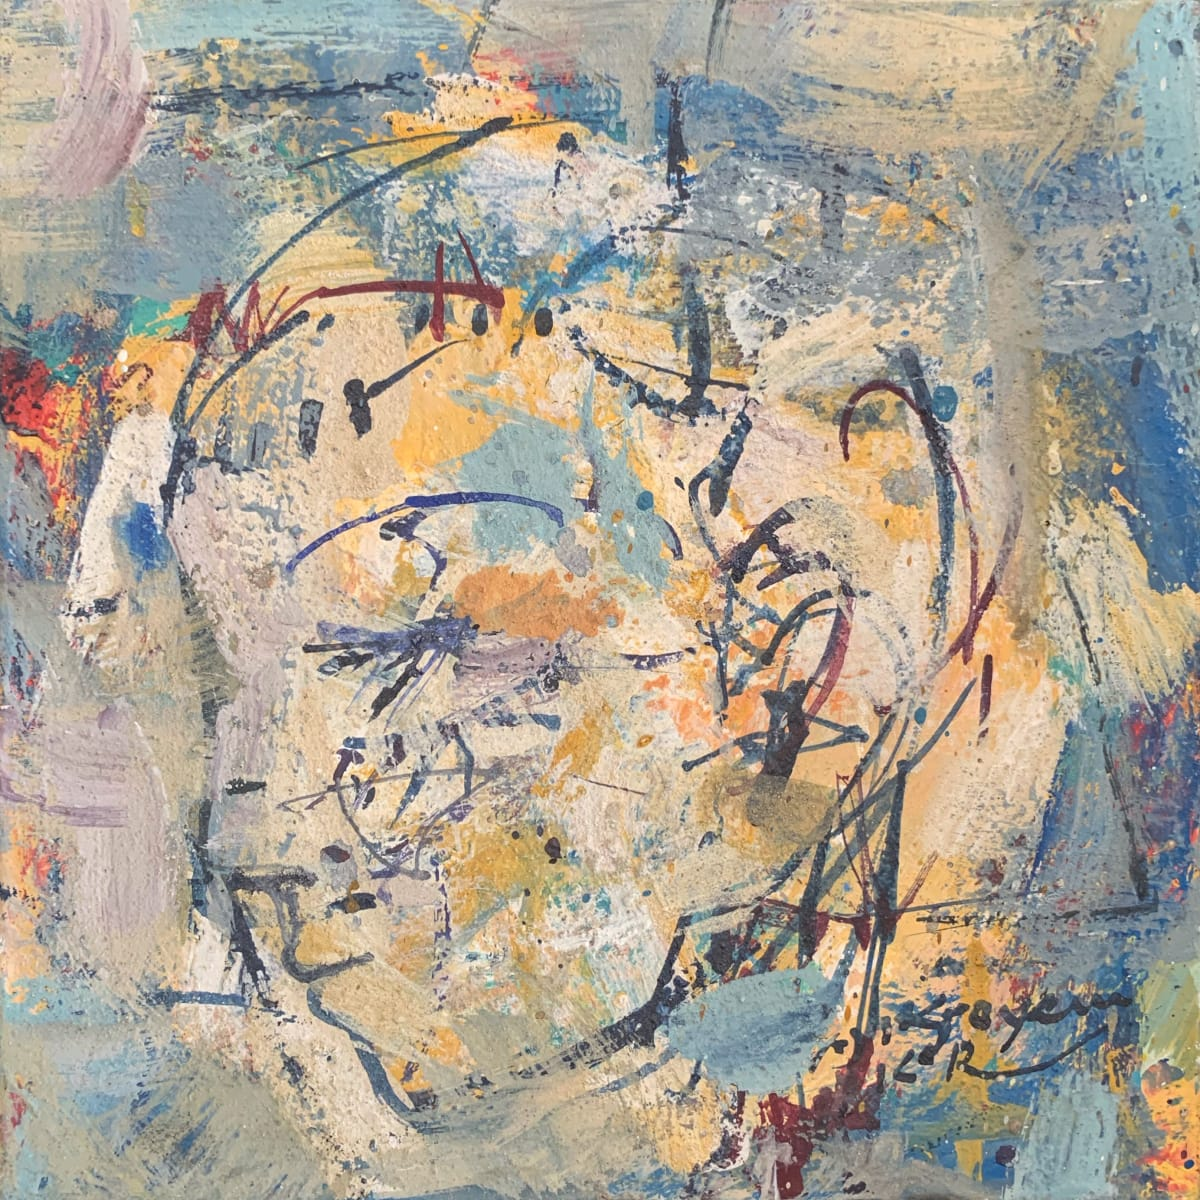 Krayem Maria Awad Untitled , 2019 Pigment on Linen 30 x 30 cm 11 3/4 x 11 3/4 in